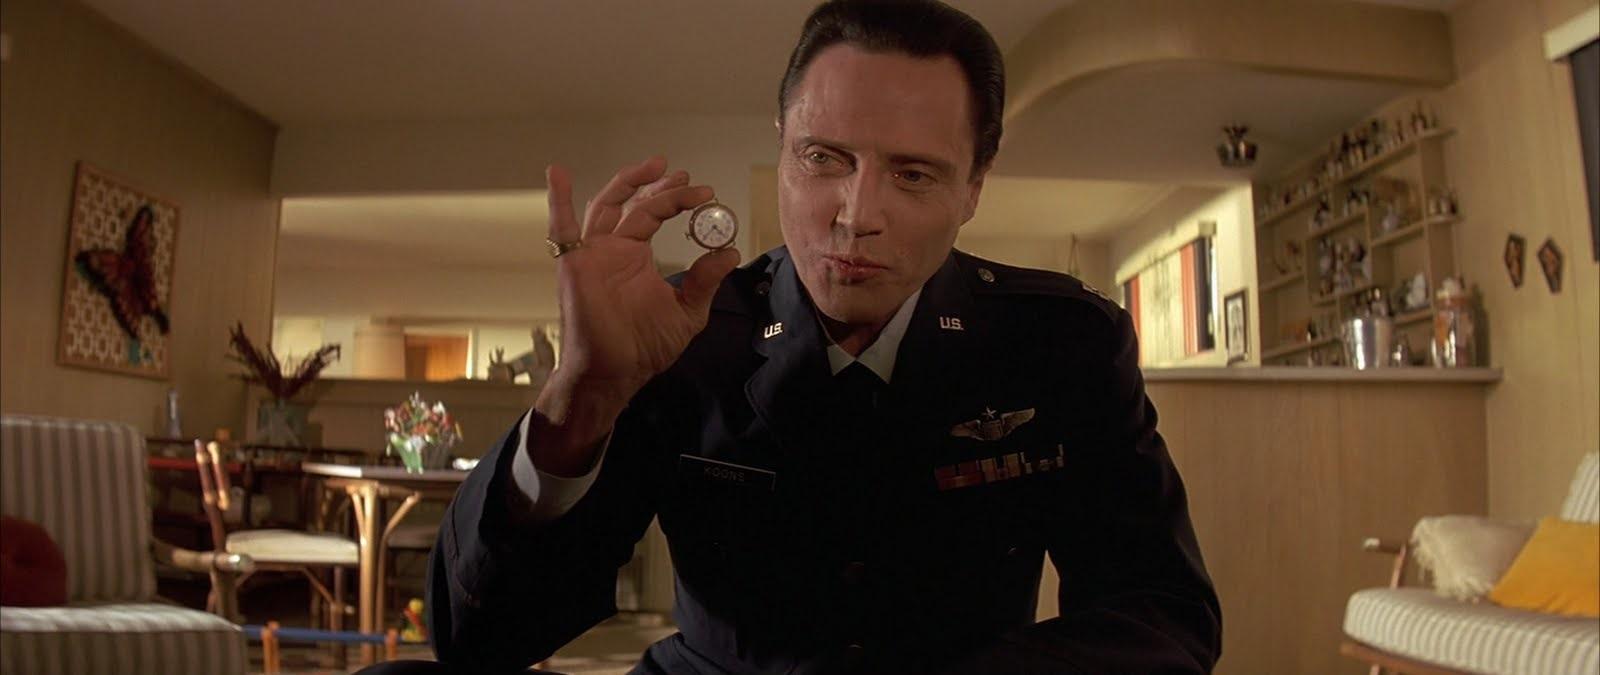 Pulp Fiction watch